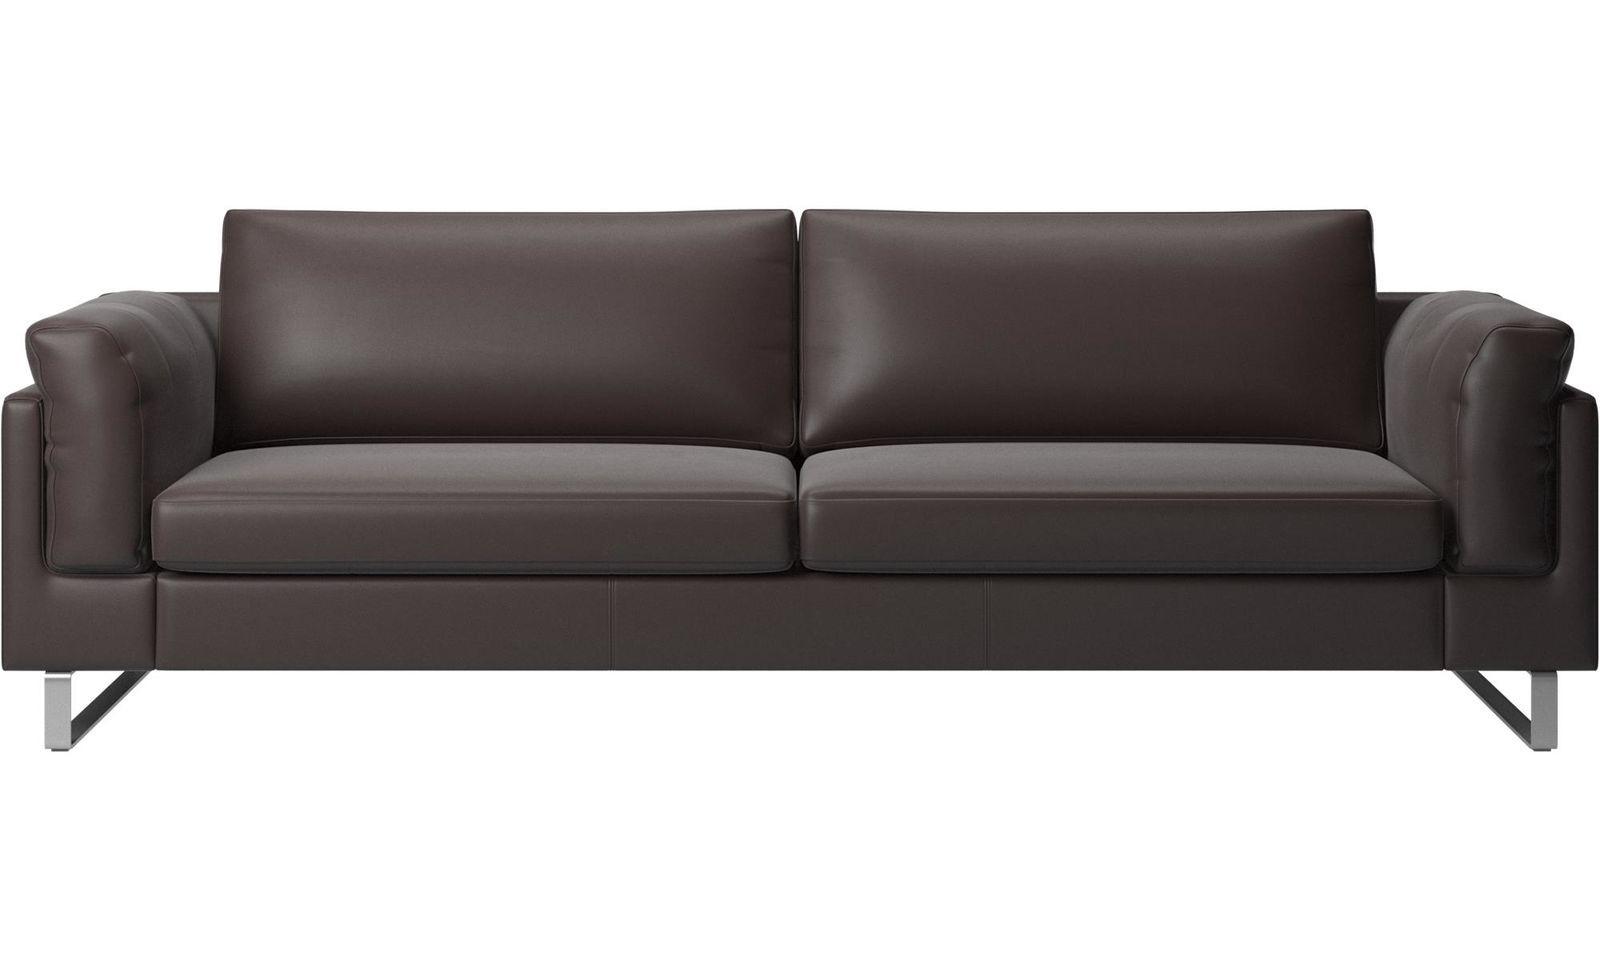 BoConcept Dark Brown Leather Sofa